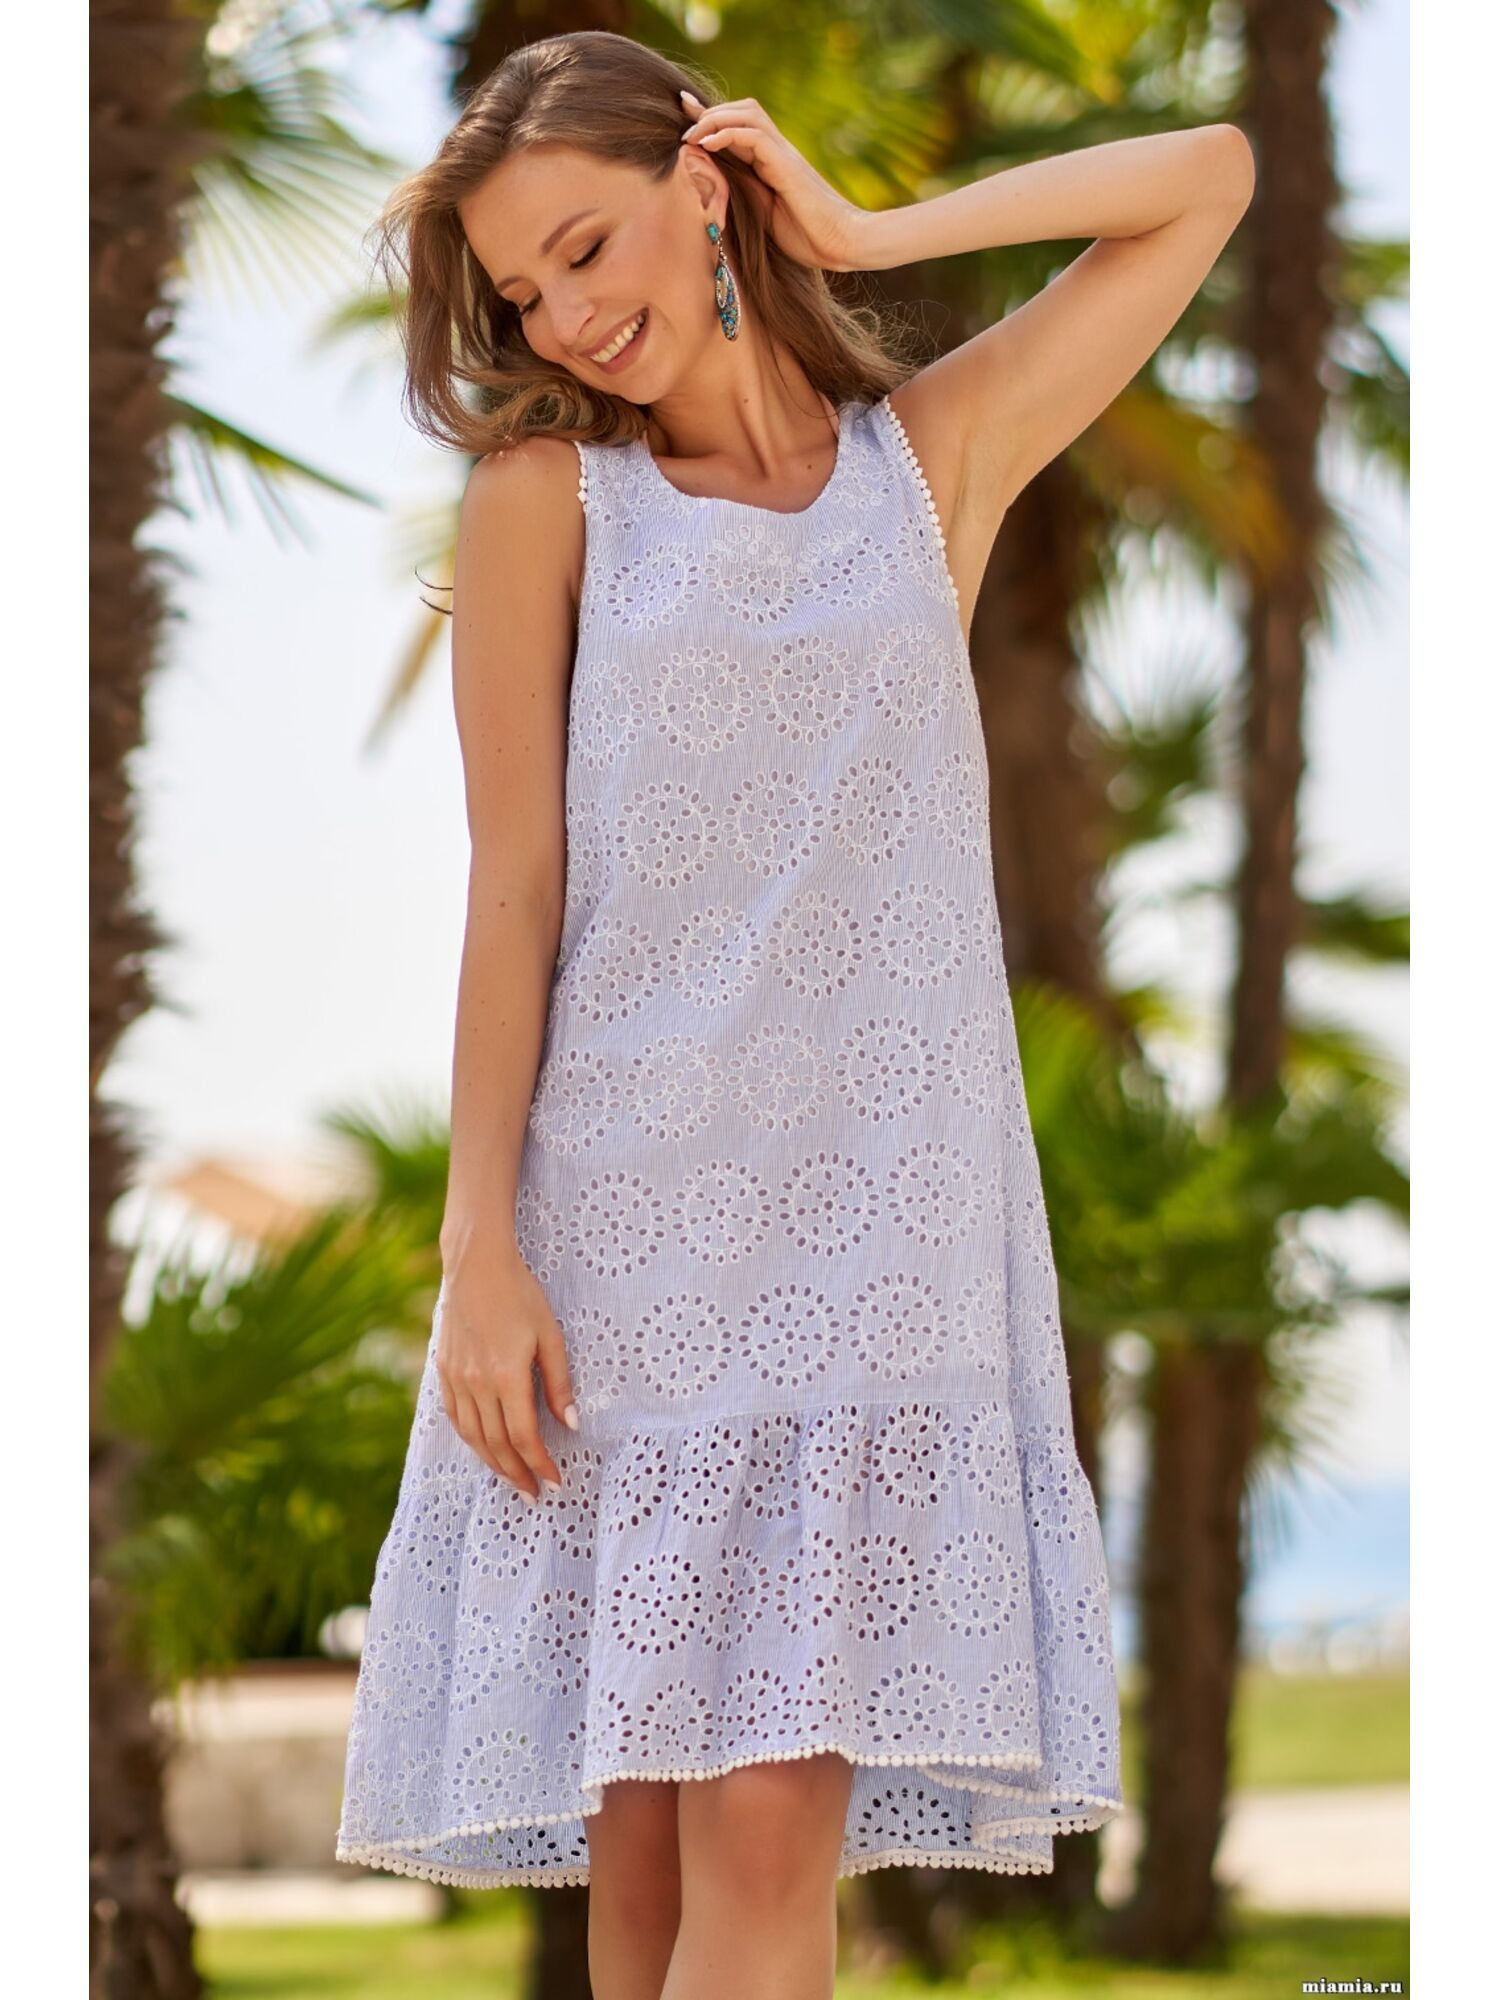 Сарафан, туника пляжная хлопковая Доминикана 1405, голубой, Mia-Amore